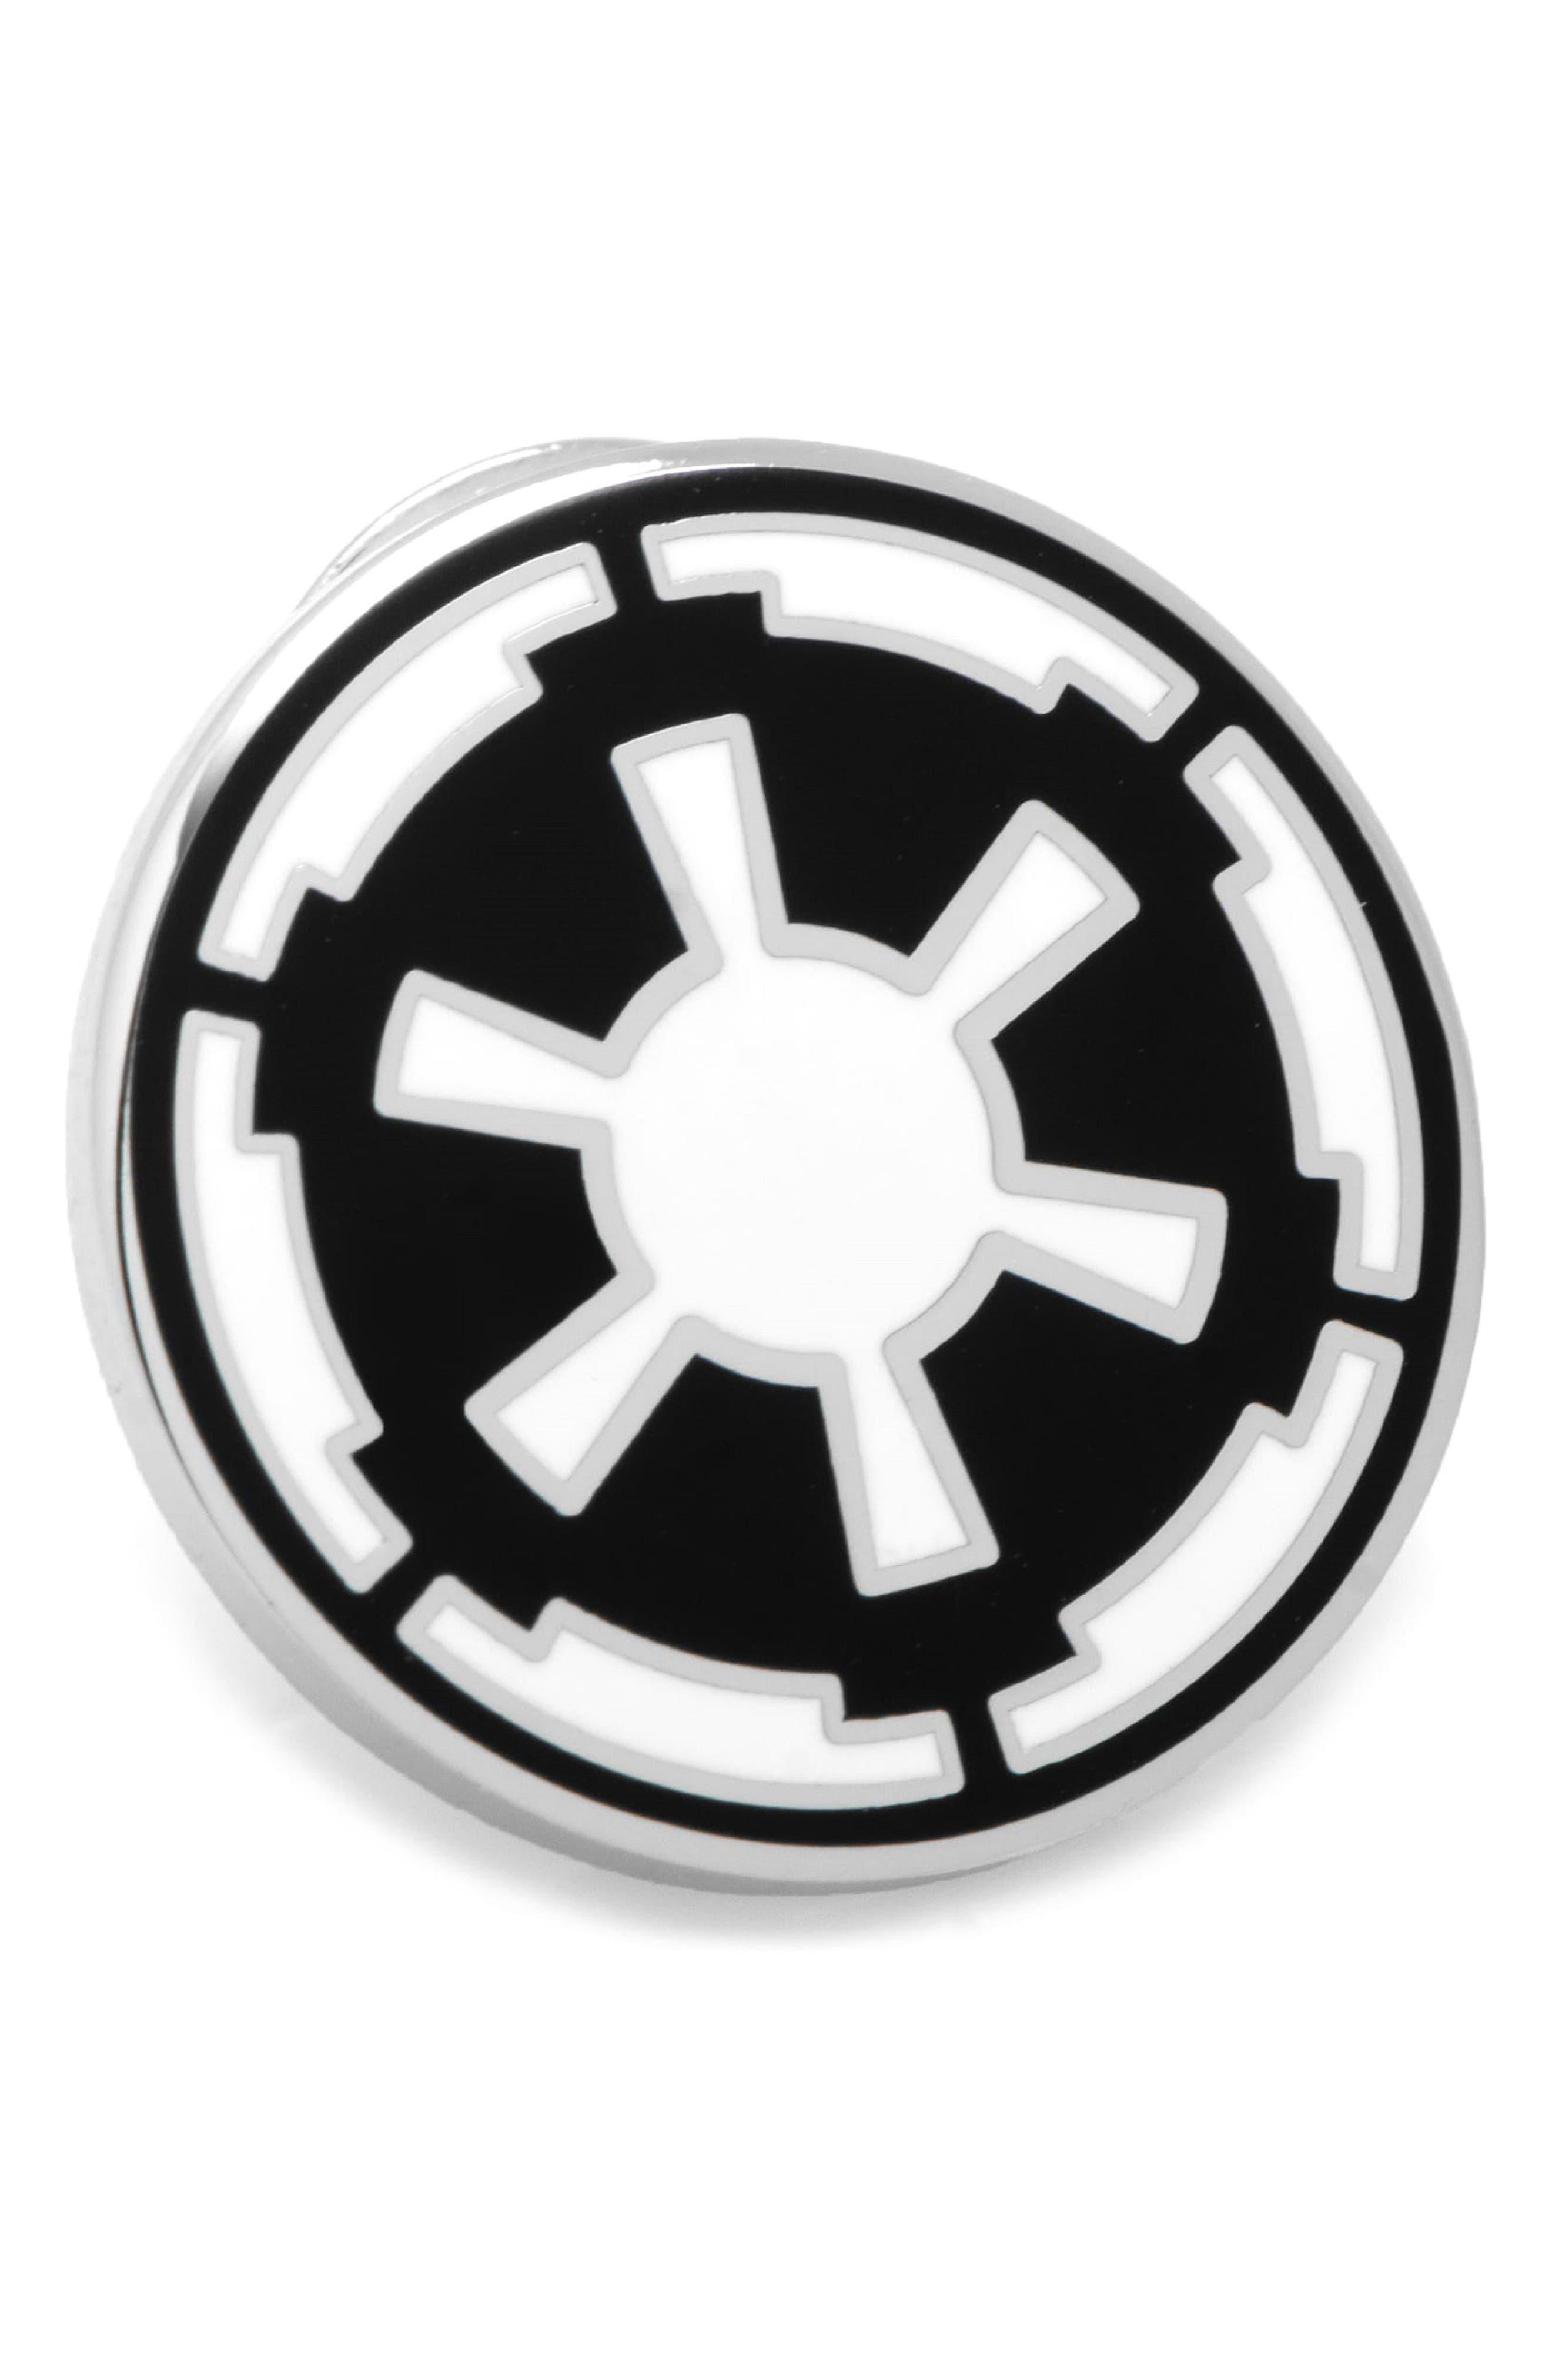 Star Wars<sup>™</sup> - Imperial Lapel Pin,                             Main thumbnail 1, color,                             Silver